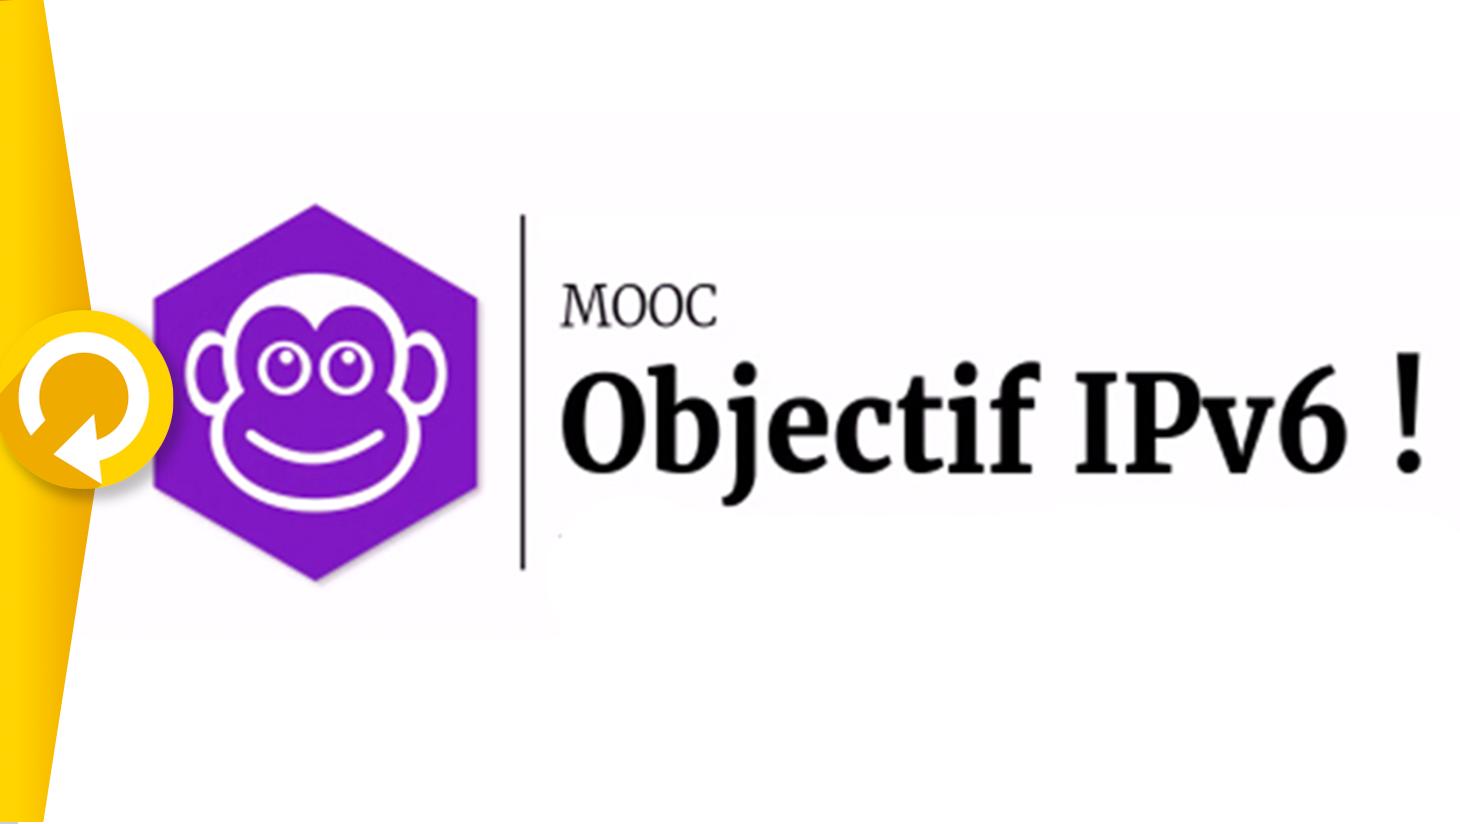 128001 Objectif IPv6 Accueil